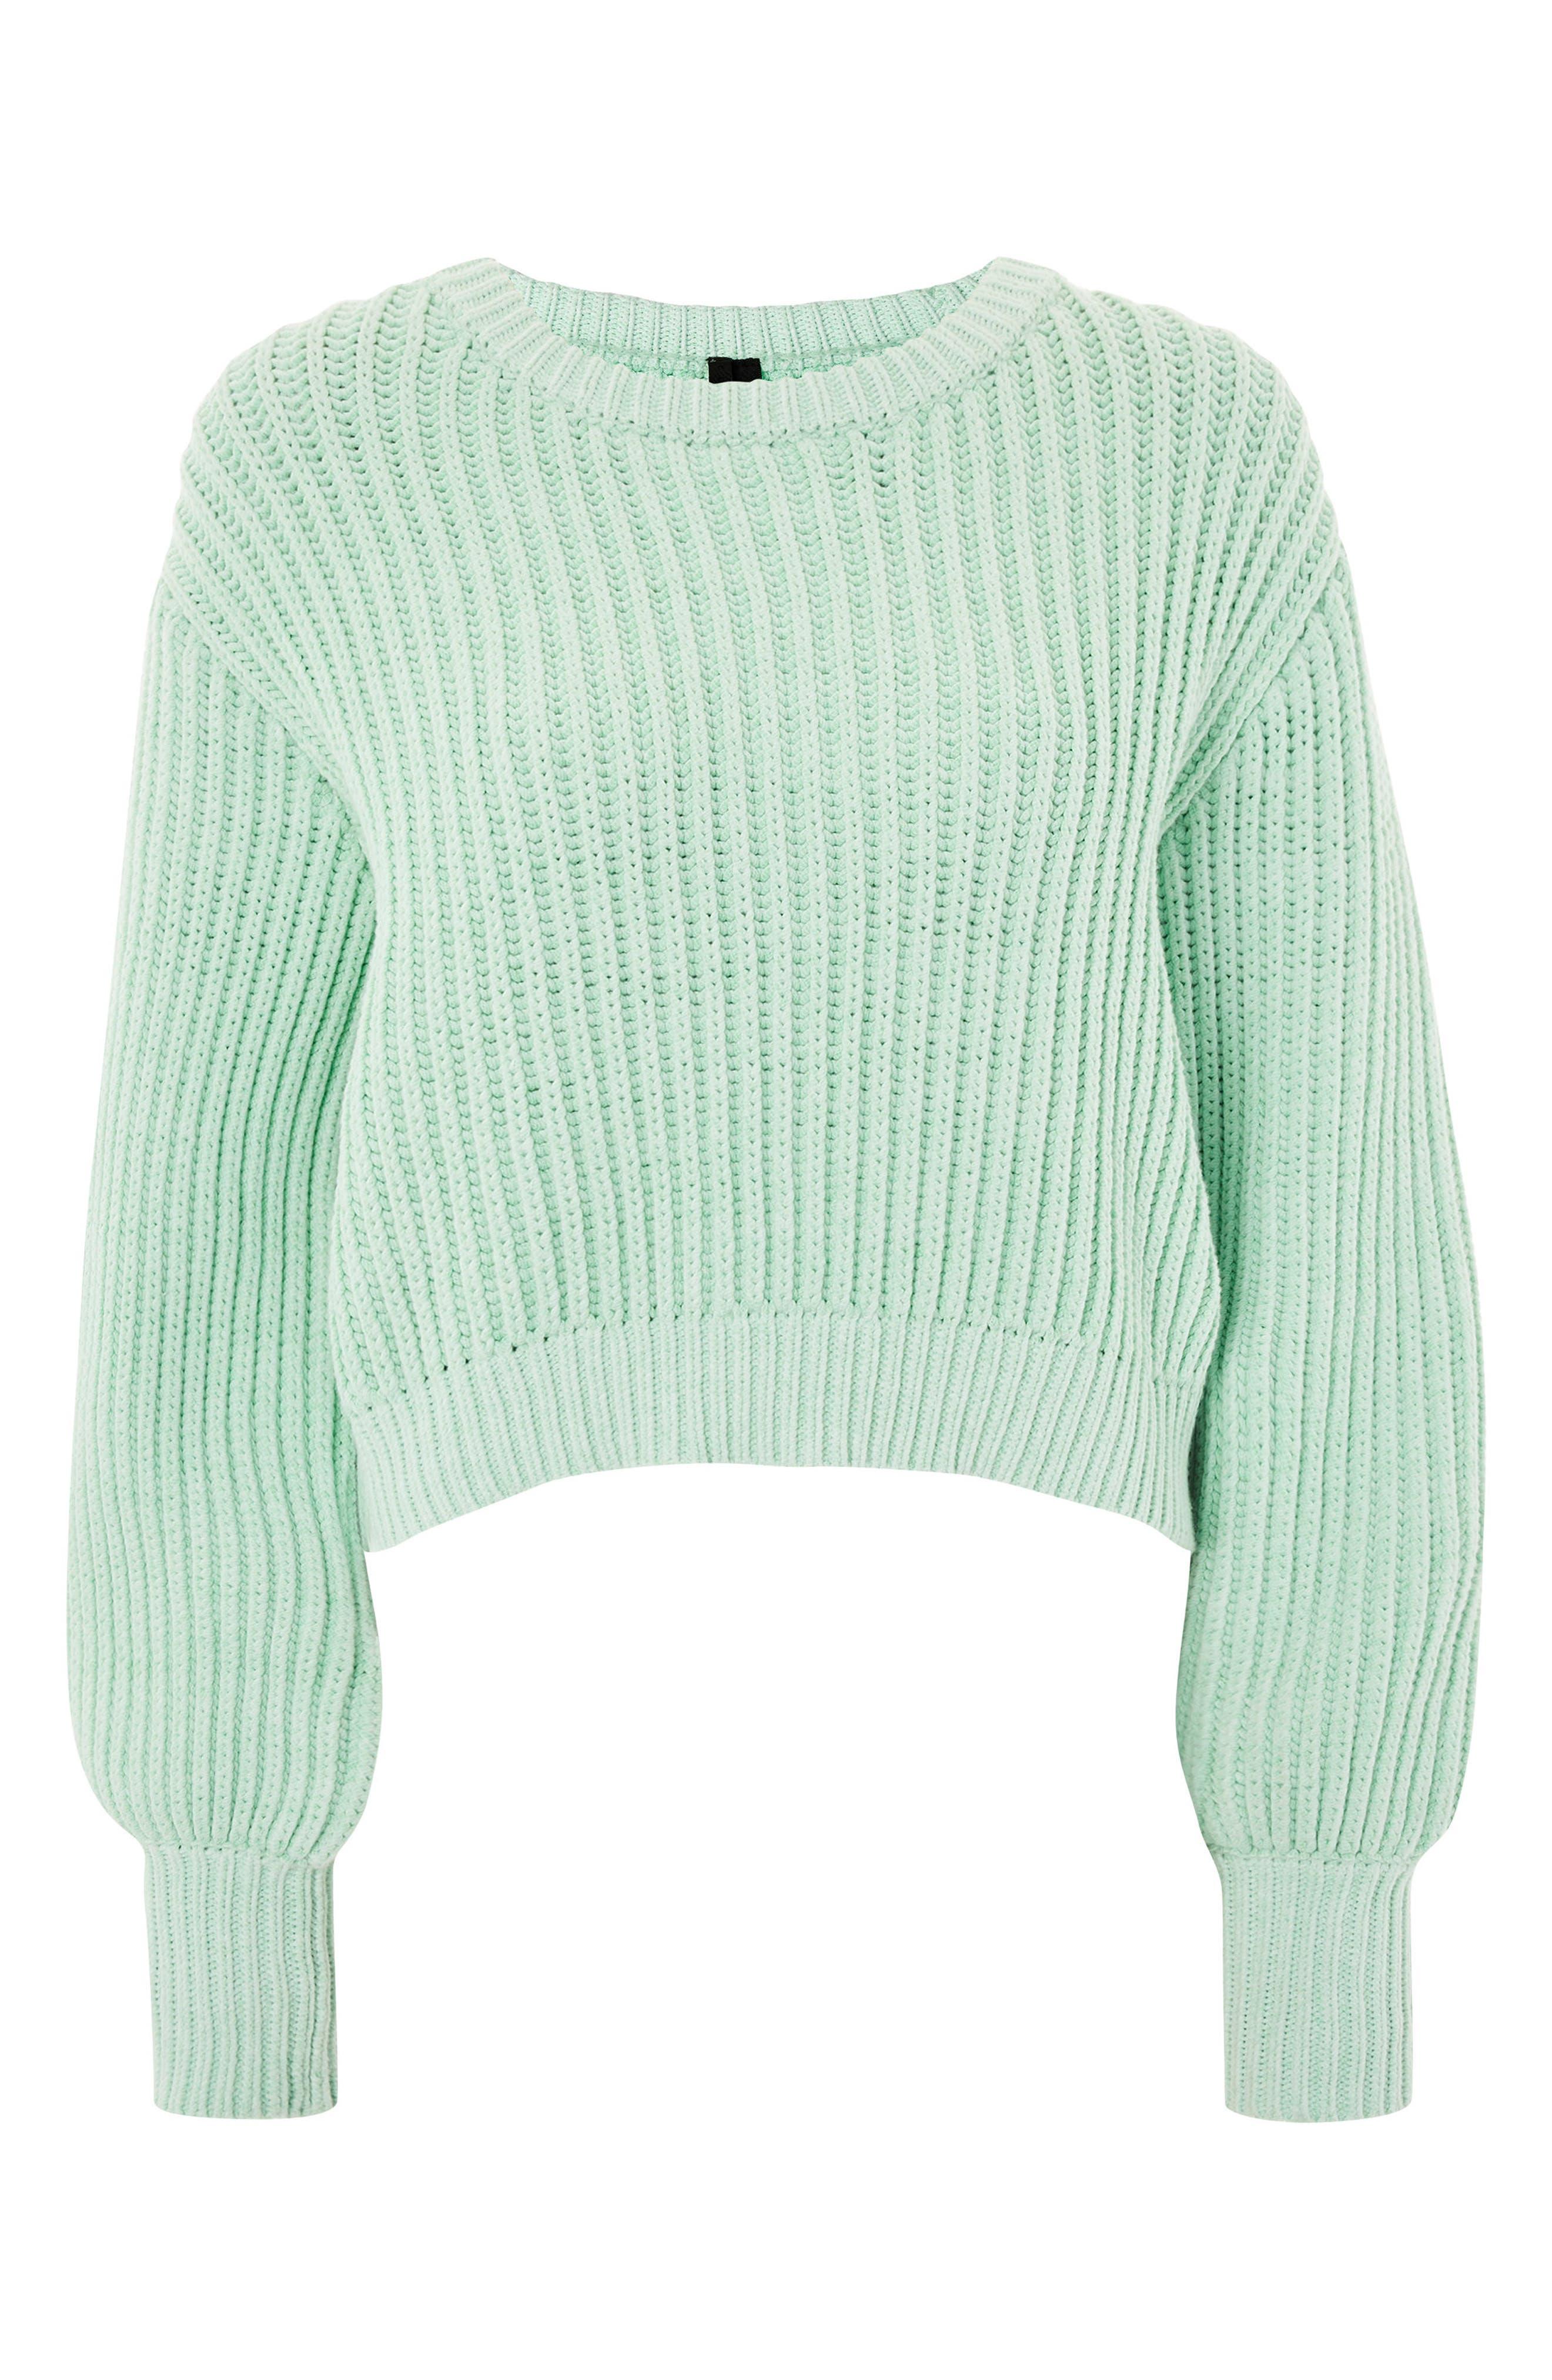 Fisherman Crewneck Sweater,                         Main,                         color, Light Green